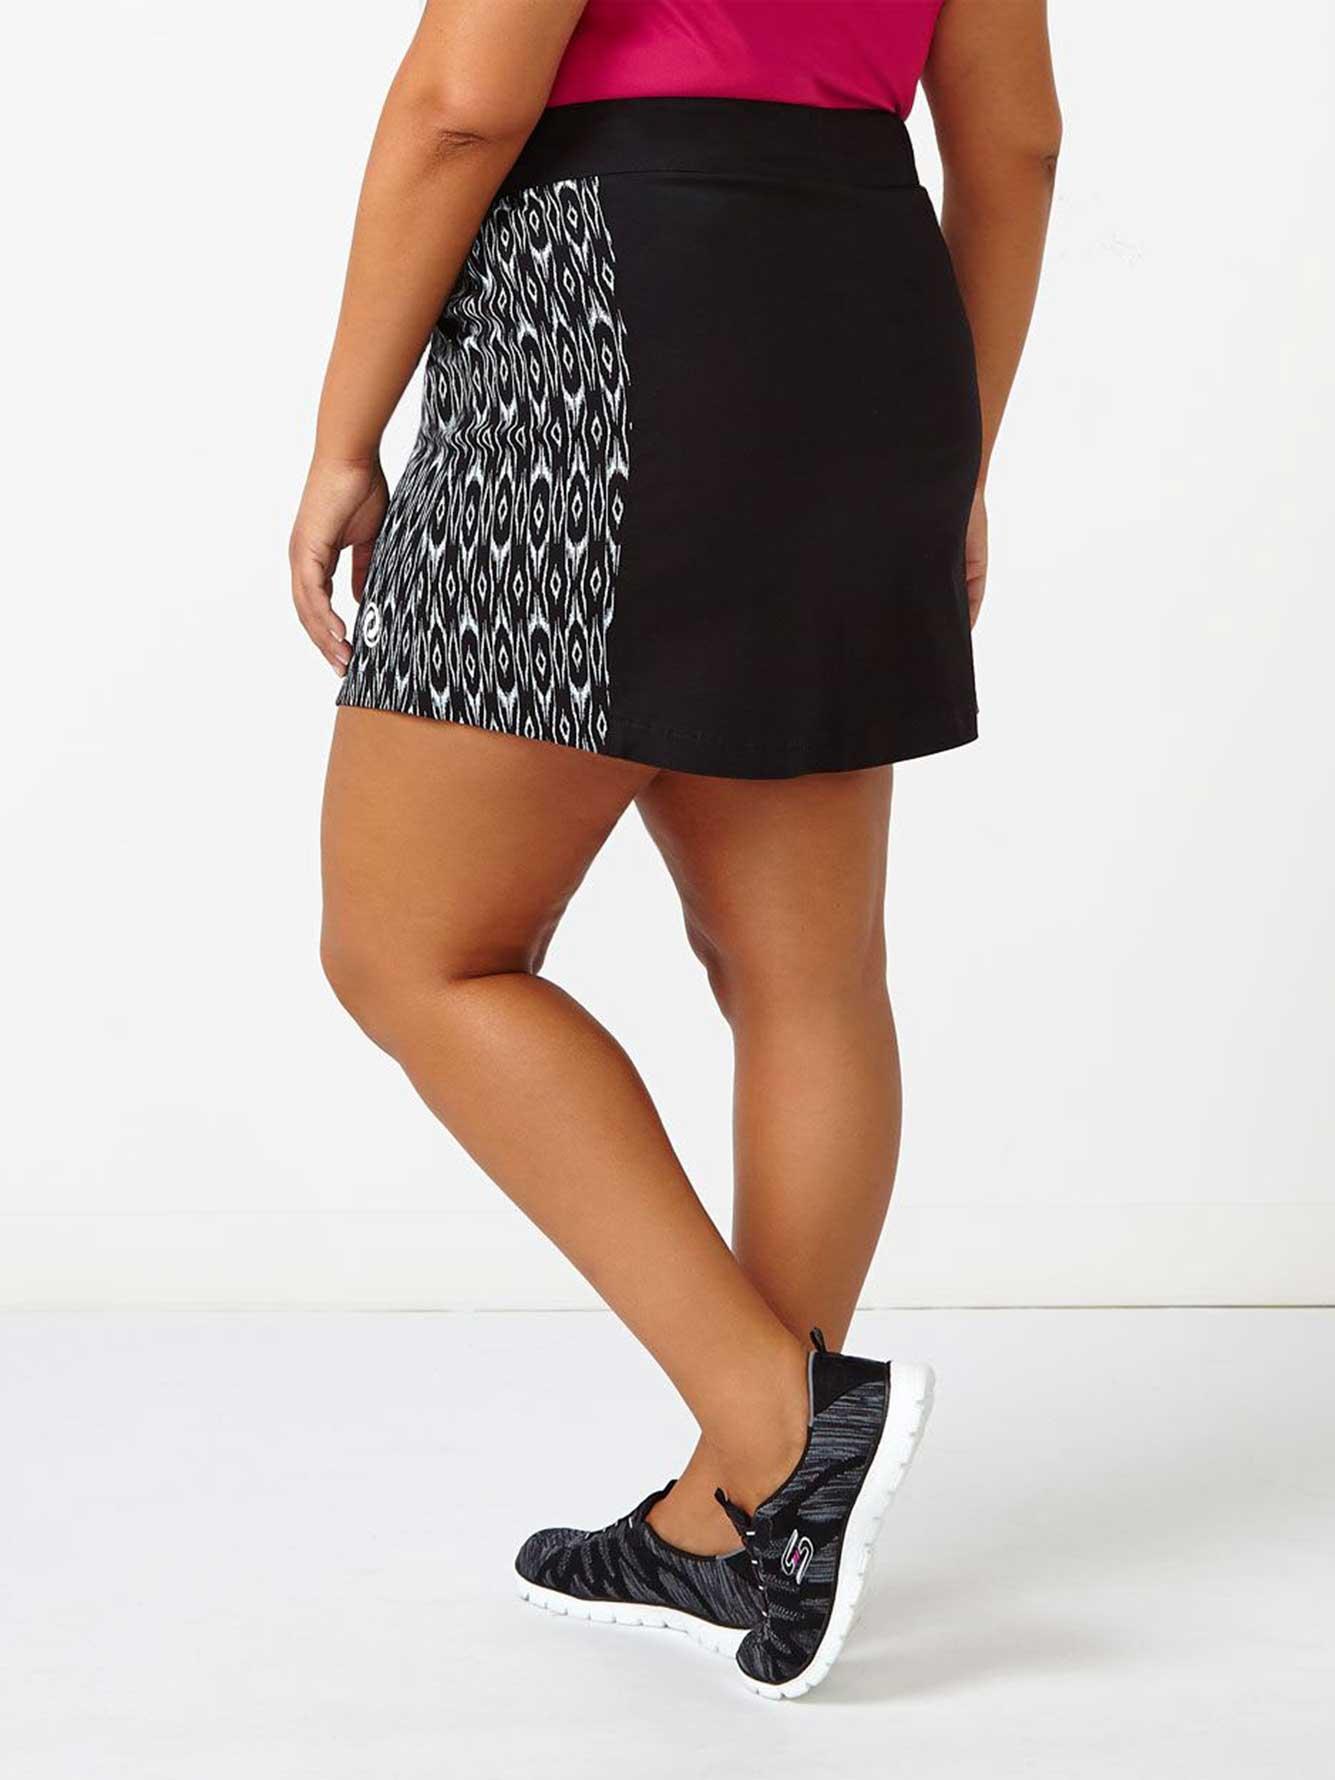 sports jupe culotte de golf taille plus penningtons. Black Bedroom Furniture Sets. Home Design Ideas